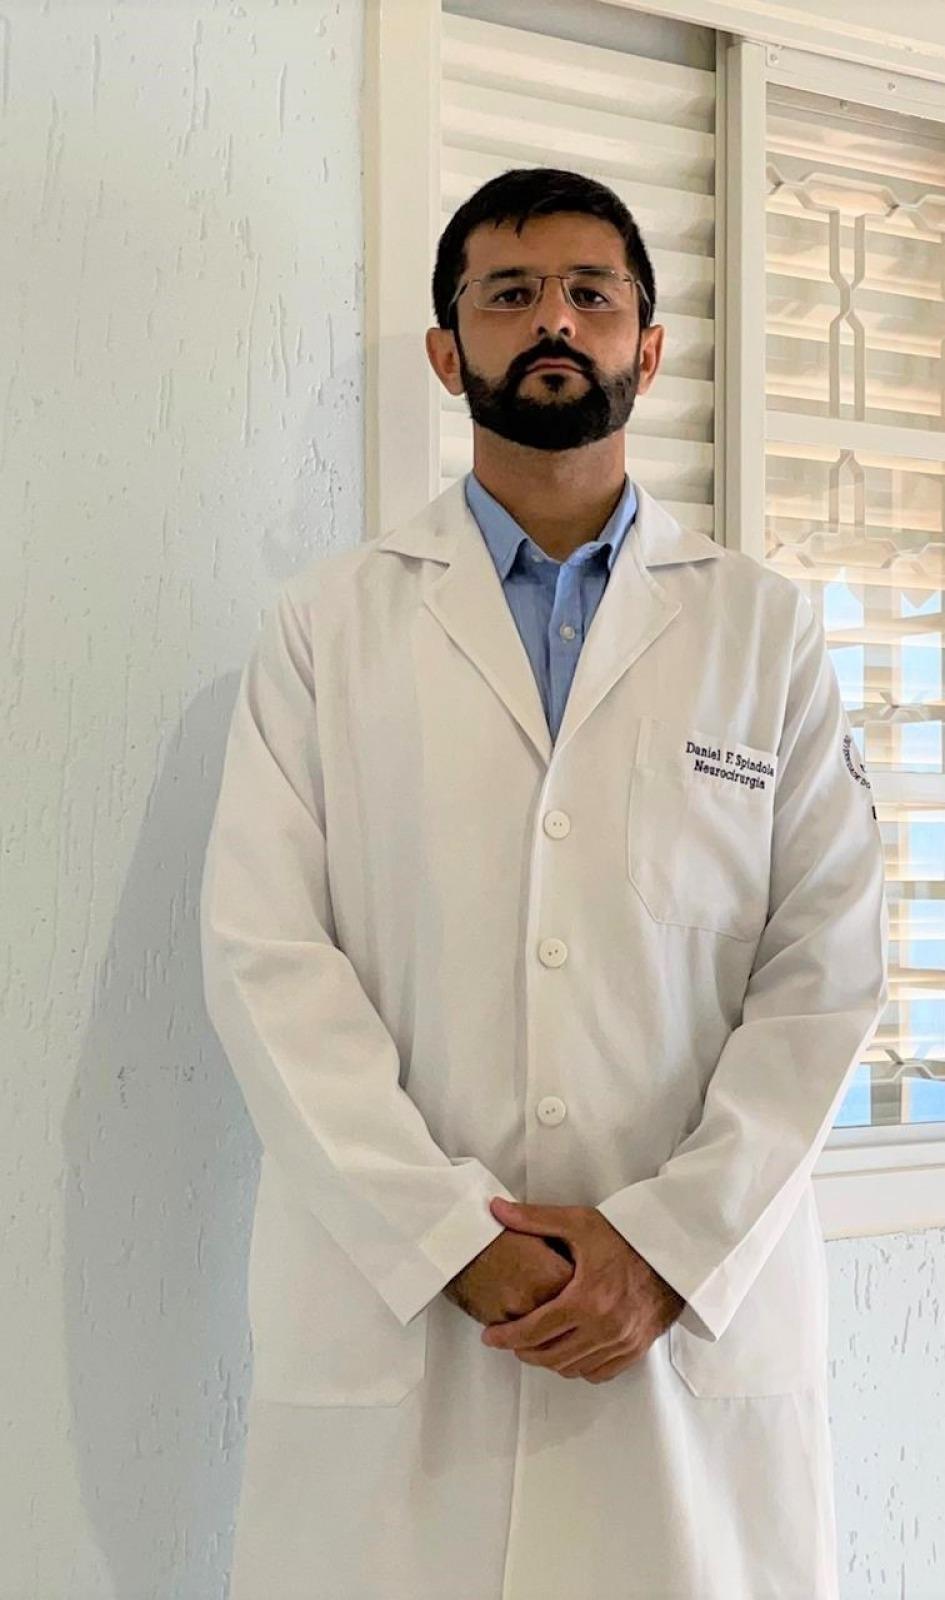 Dr Daniel Ferreira Spíndola